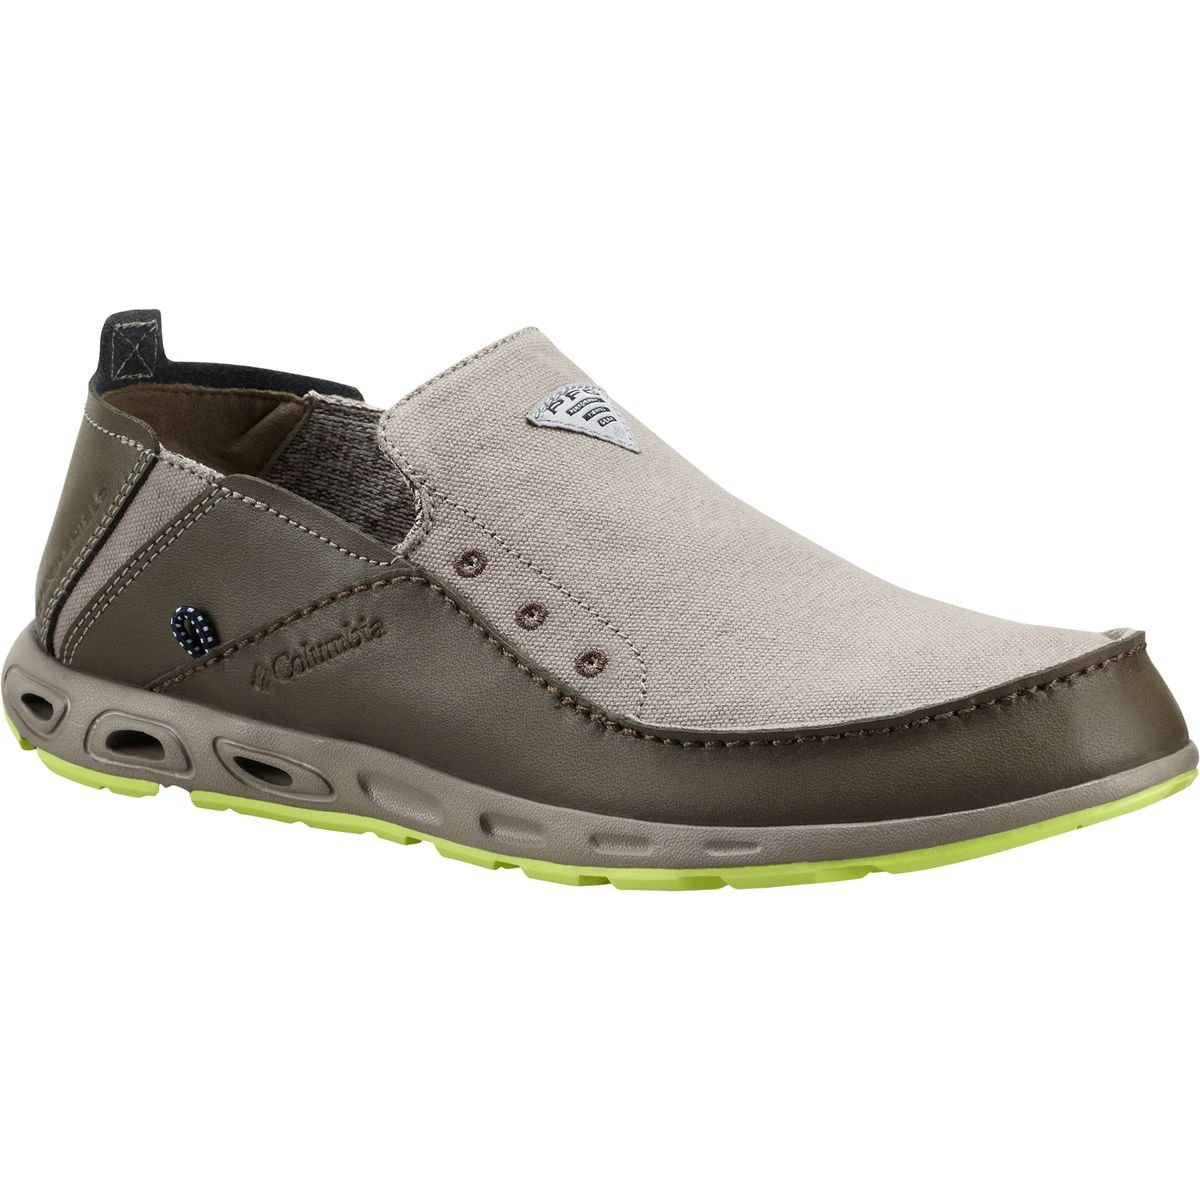 [Columbia] (コロンビア) Bahama Vent PFG Shoe メンズ ウォーターシューズ [並行輸入品]   B078TBYL6S